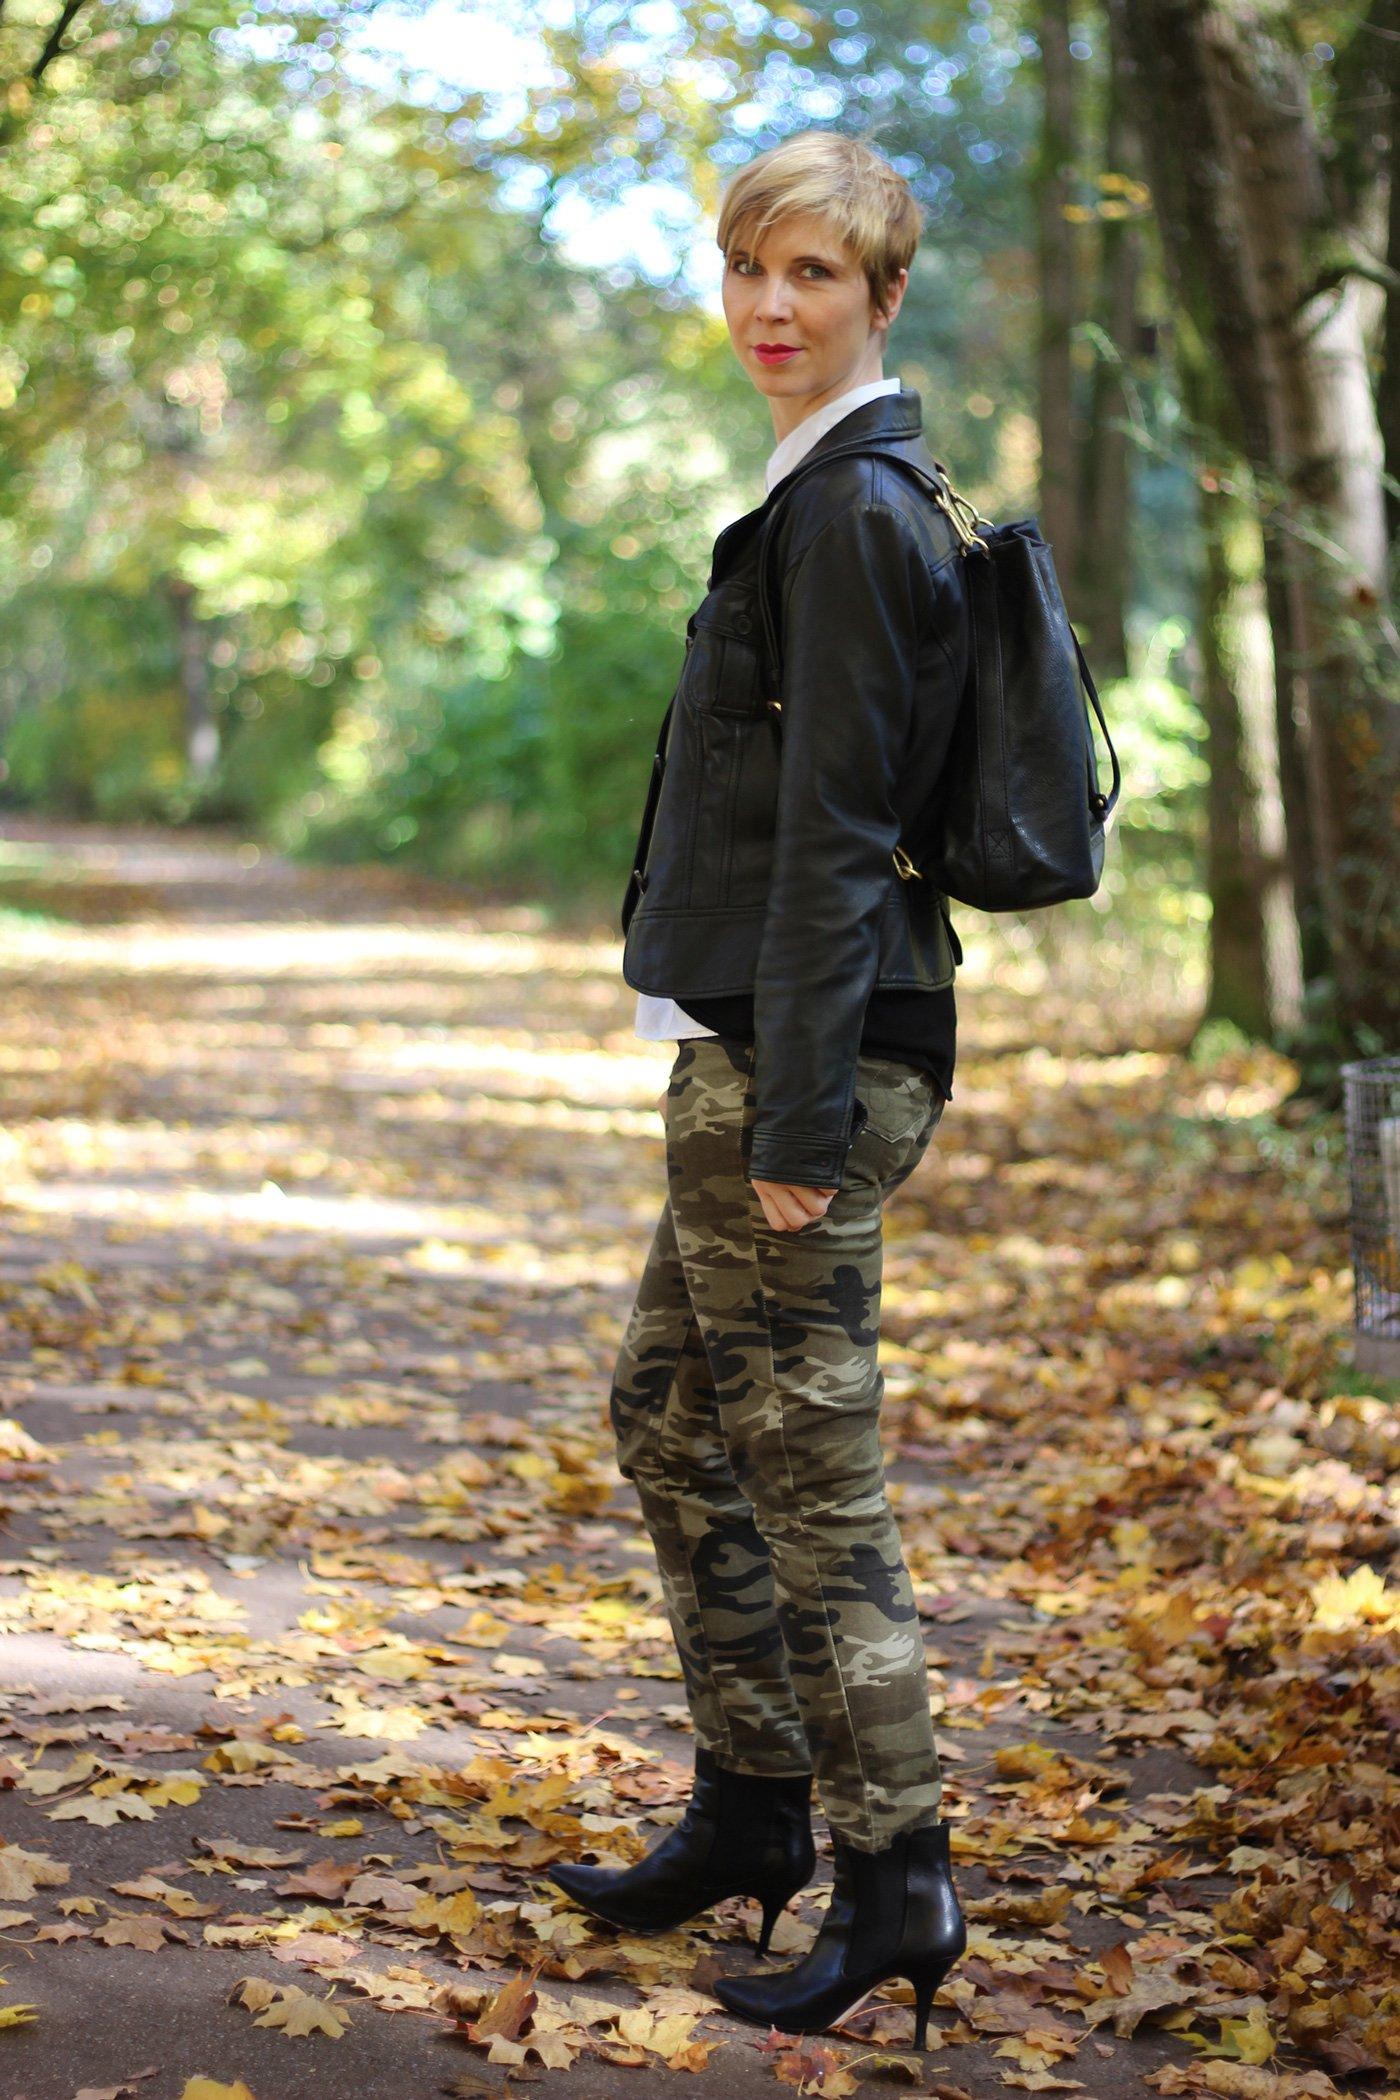 IMG_5319a_Camouflage_Set_ConnyDoll_AHemadundahos_H&M_Pulli_Espritbluse_schwarzweiß_Blackandwhite_Rucksack_DuneLondon_Gold_Zarakette